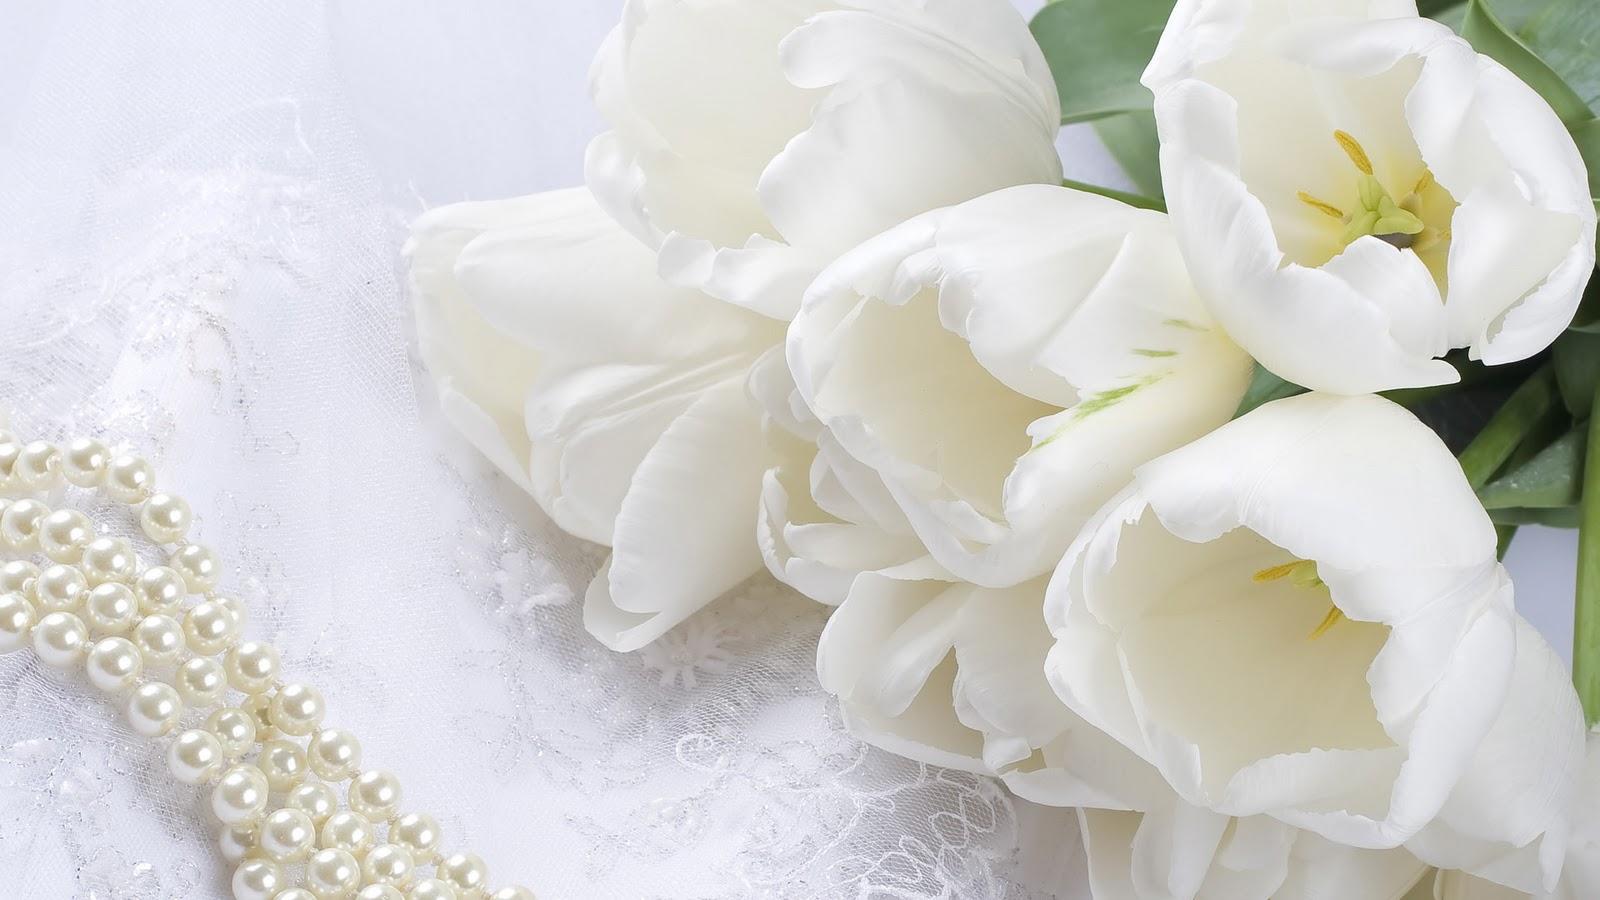 White Flower Wallpaper Wallpapersafari